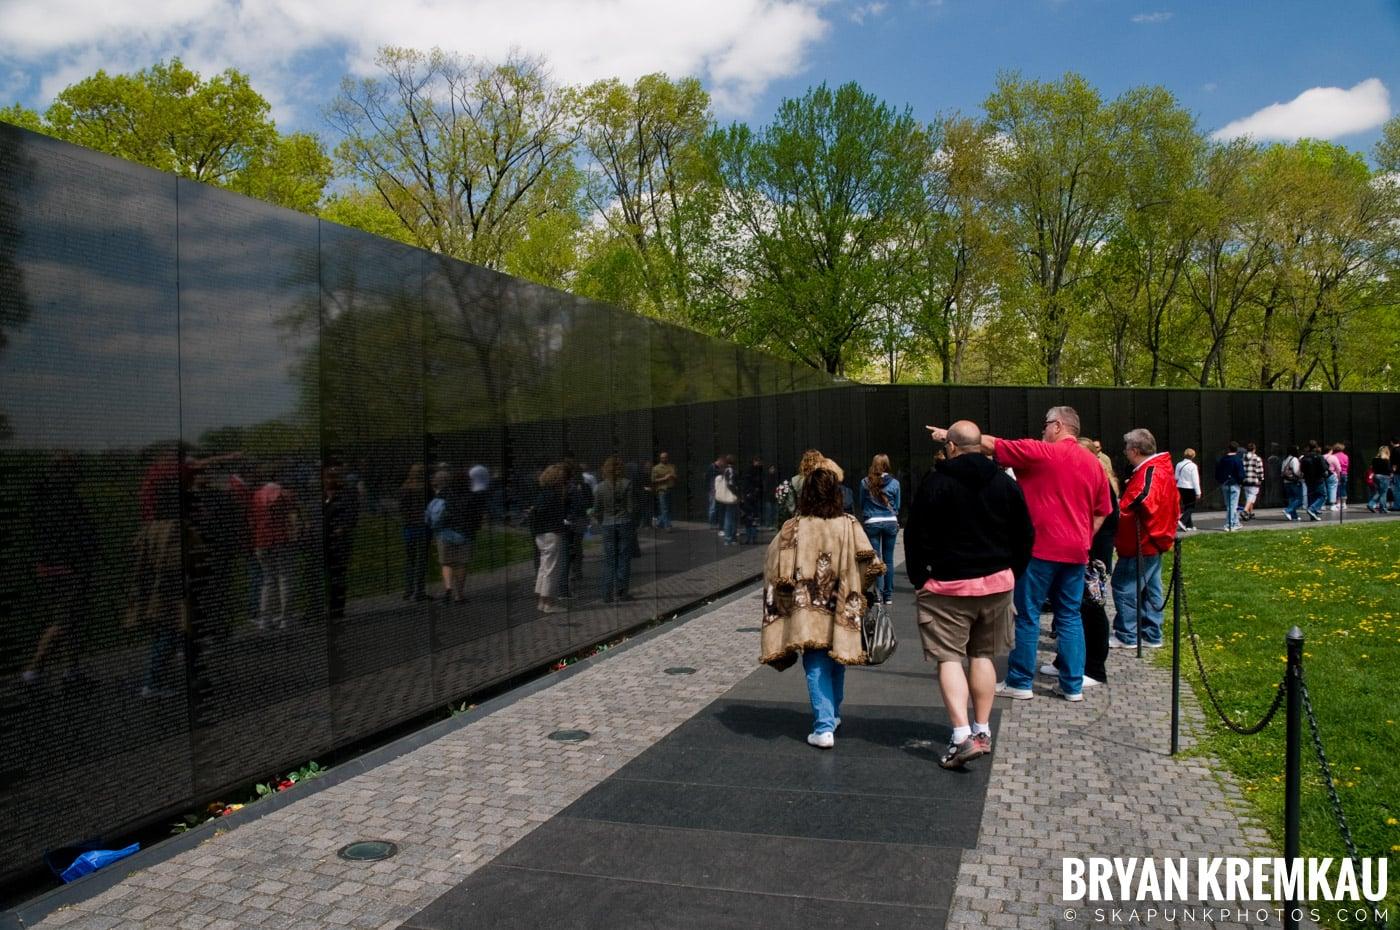 Washington, DC Trip - Day 2 - 4.9.10 (2)